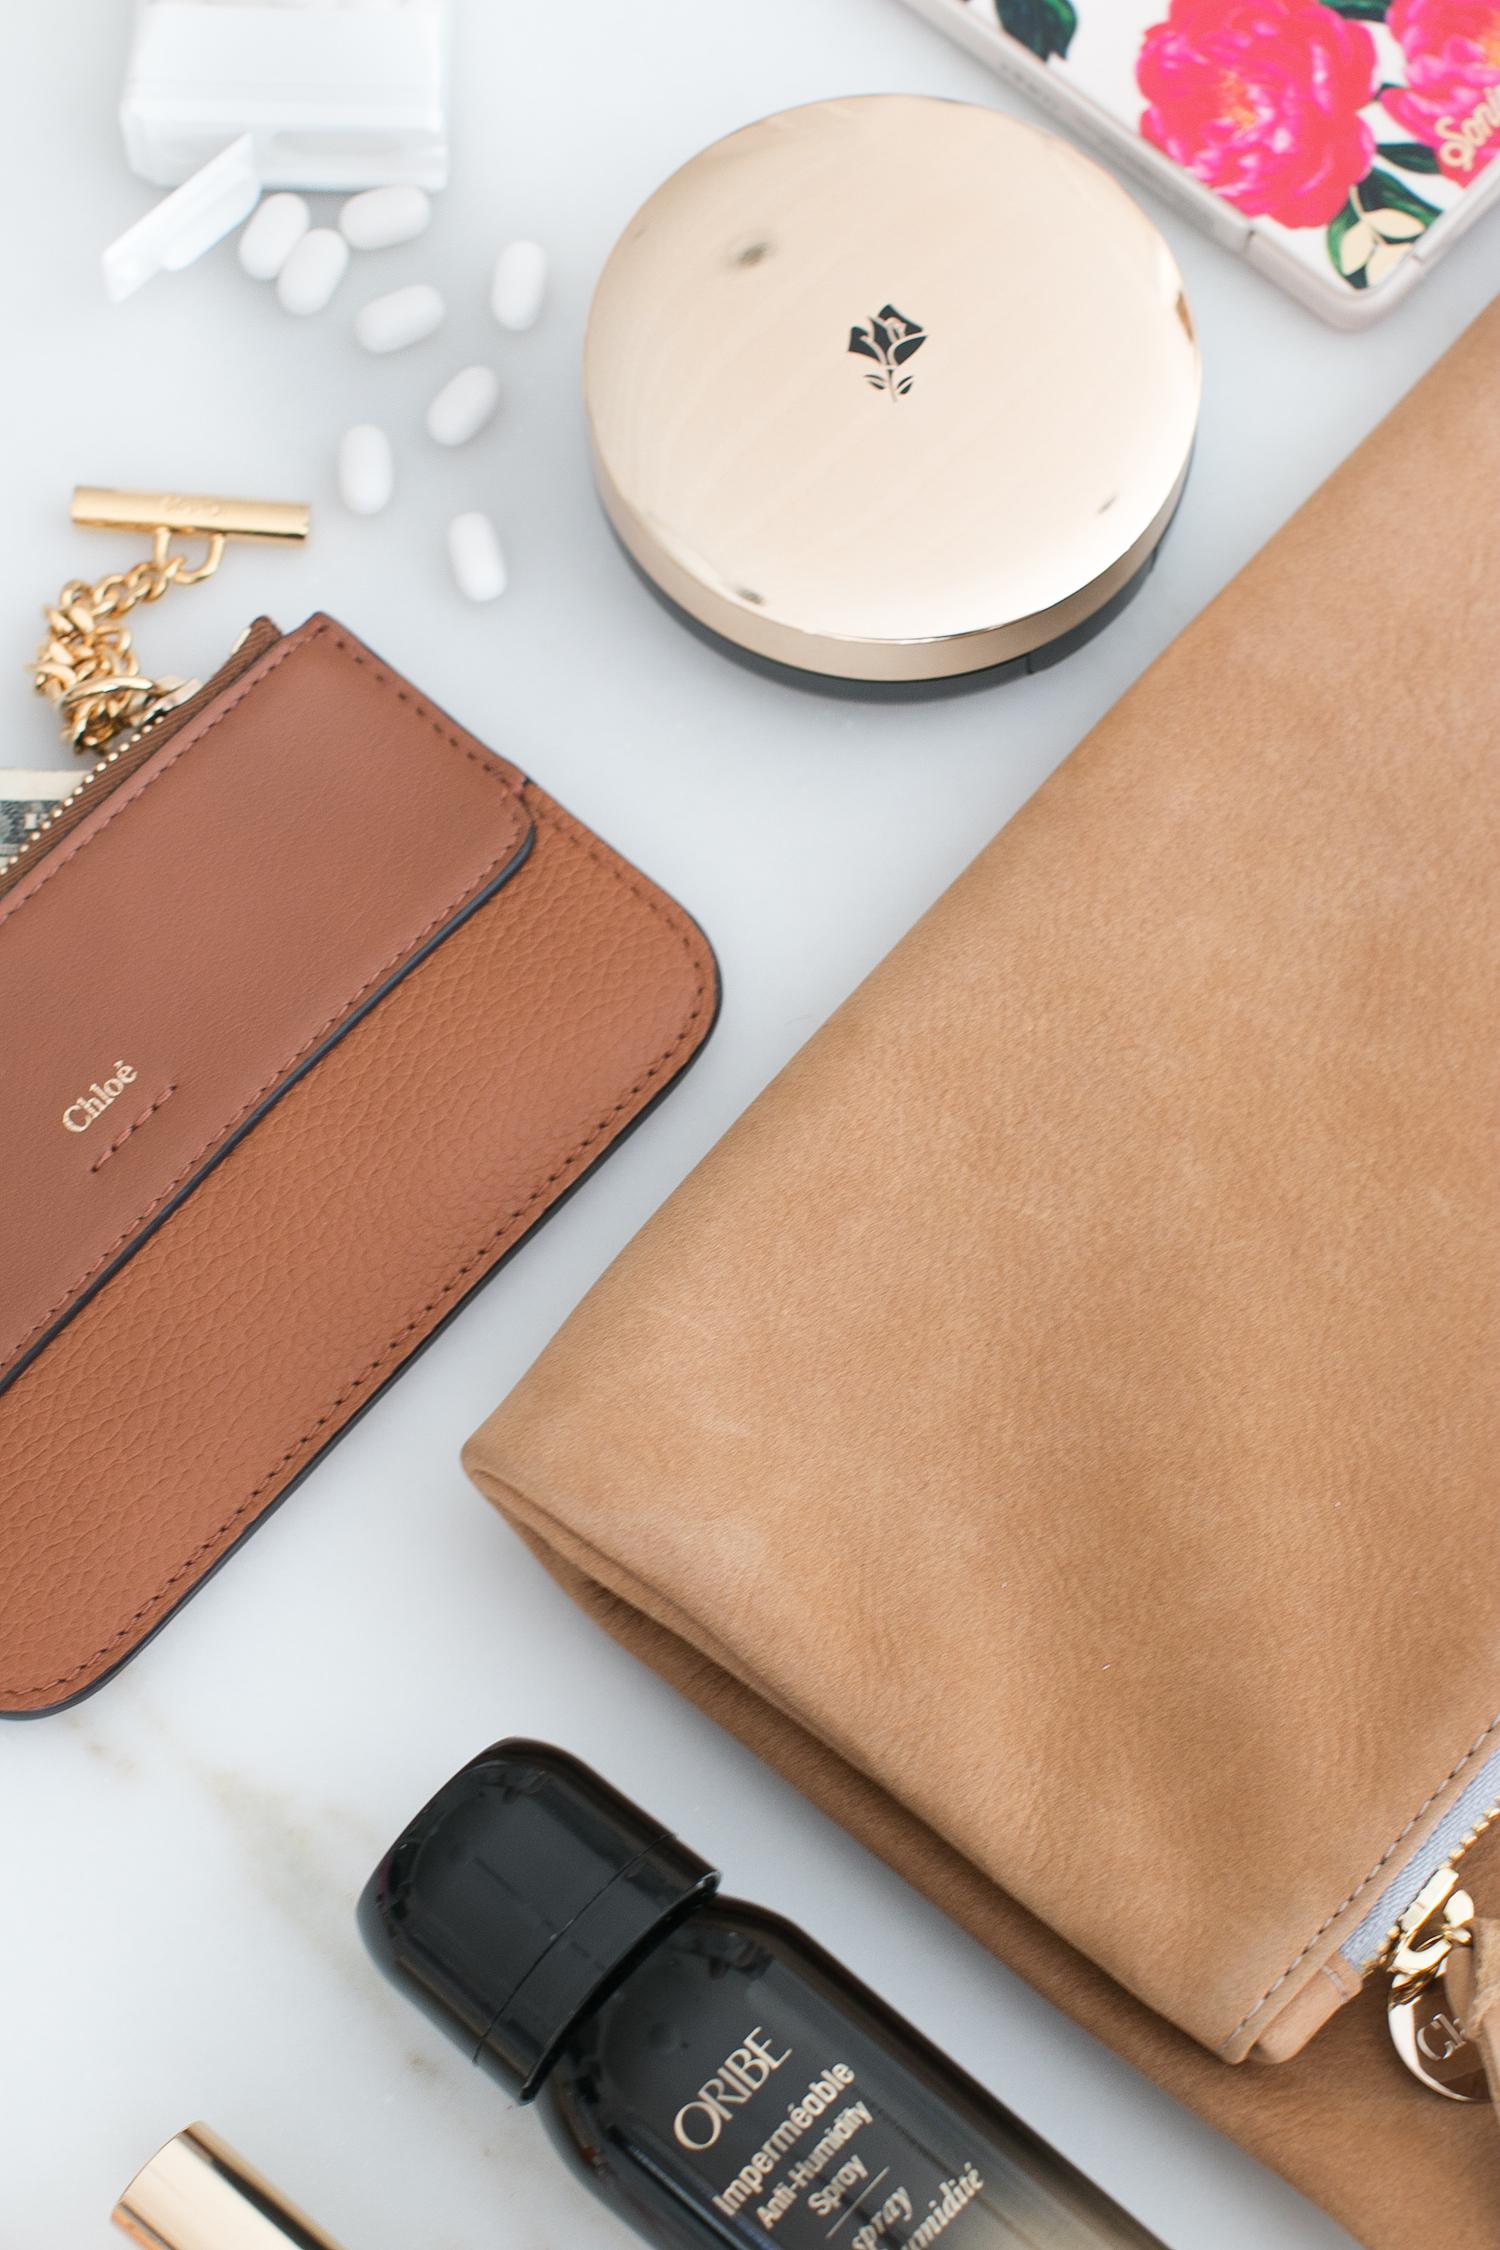 Lancome Chloe Clutch Essentials Make up Oribe Monika Hibbs